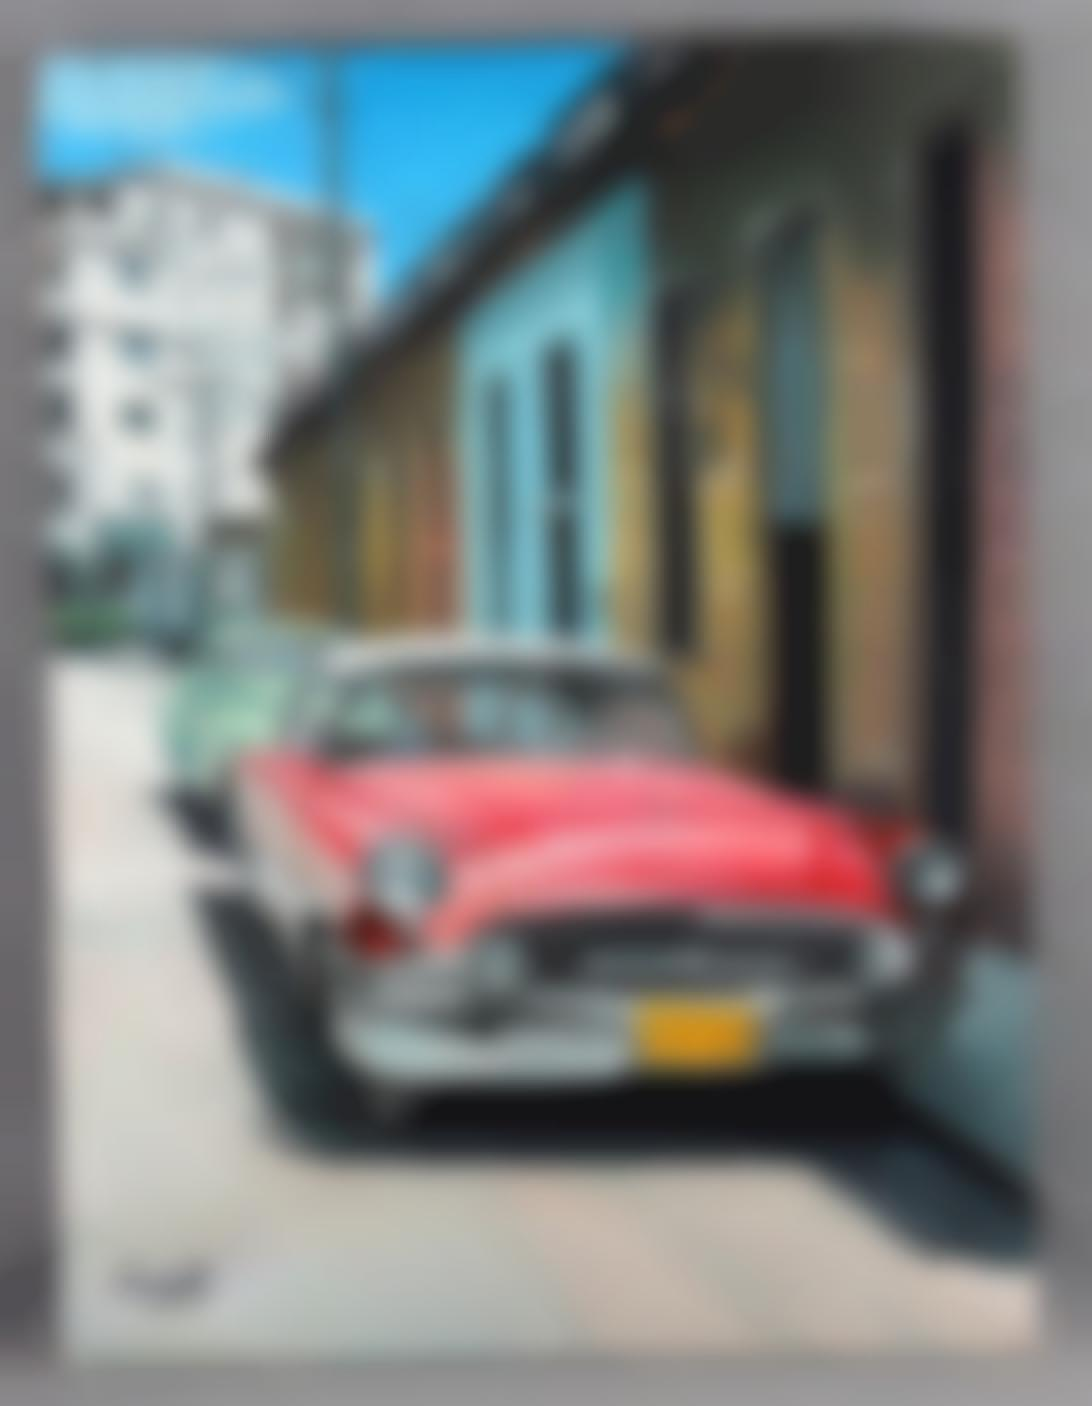 Illegible - Buick rosa-